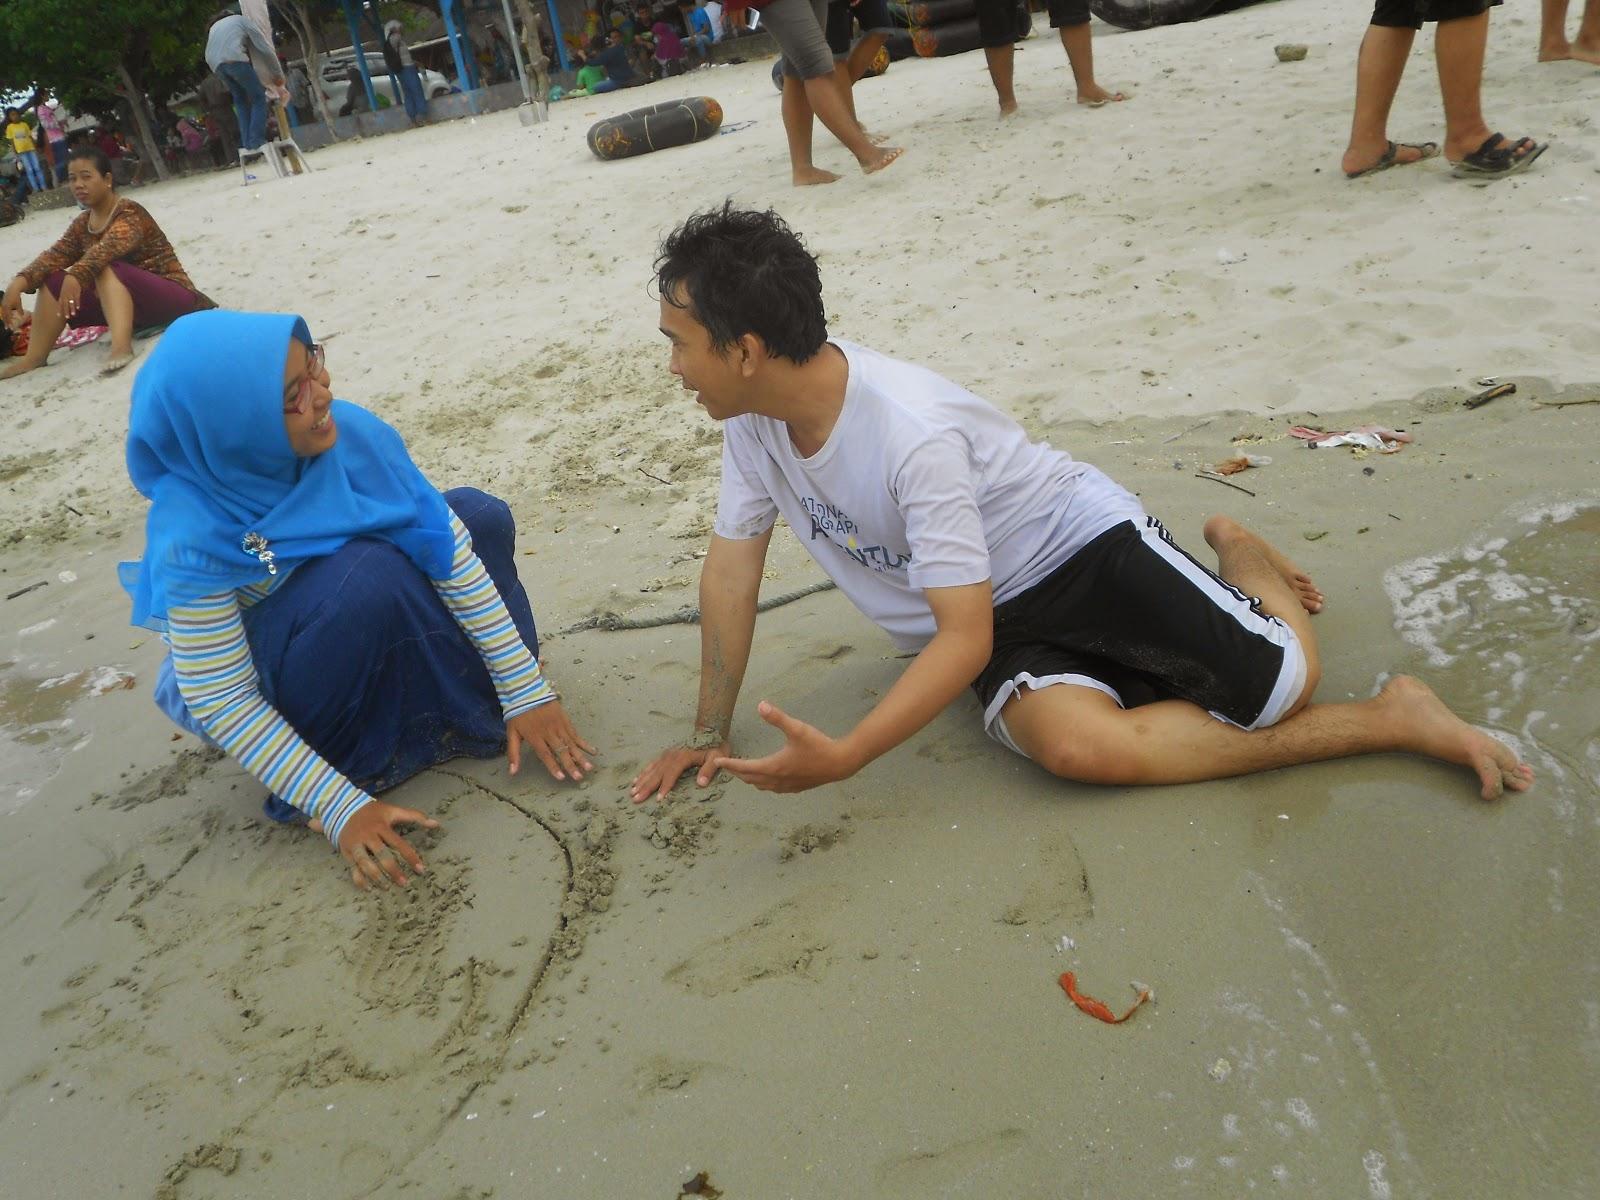 Pantai Delegan Wisata Pasir Putih Website Gresik Tiwi Akbar Bercengkerama